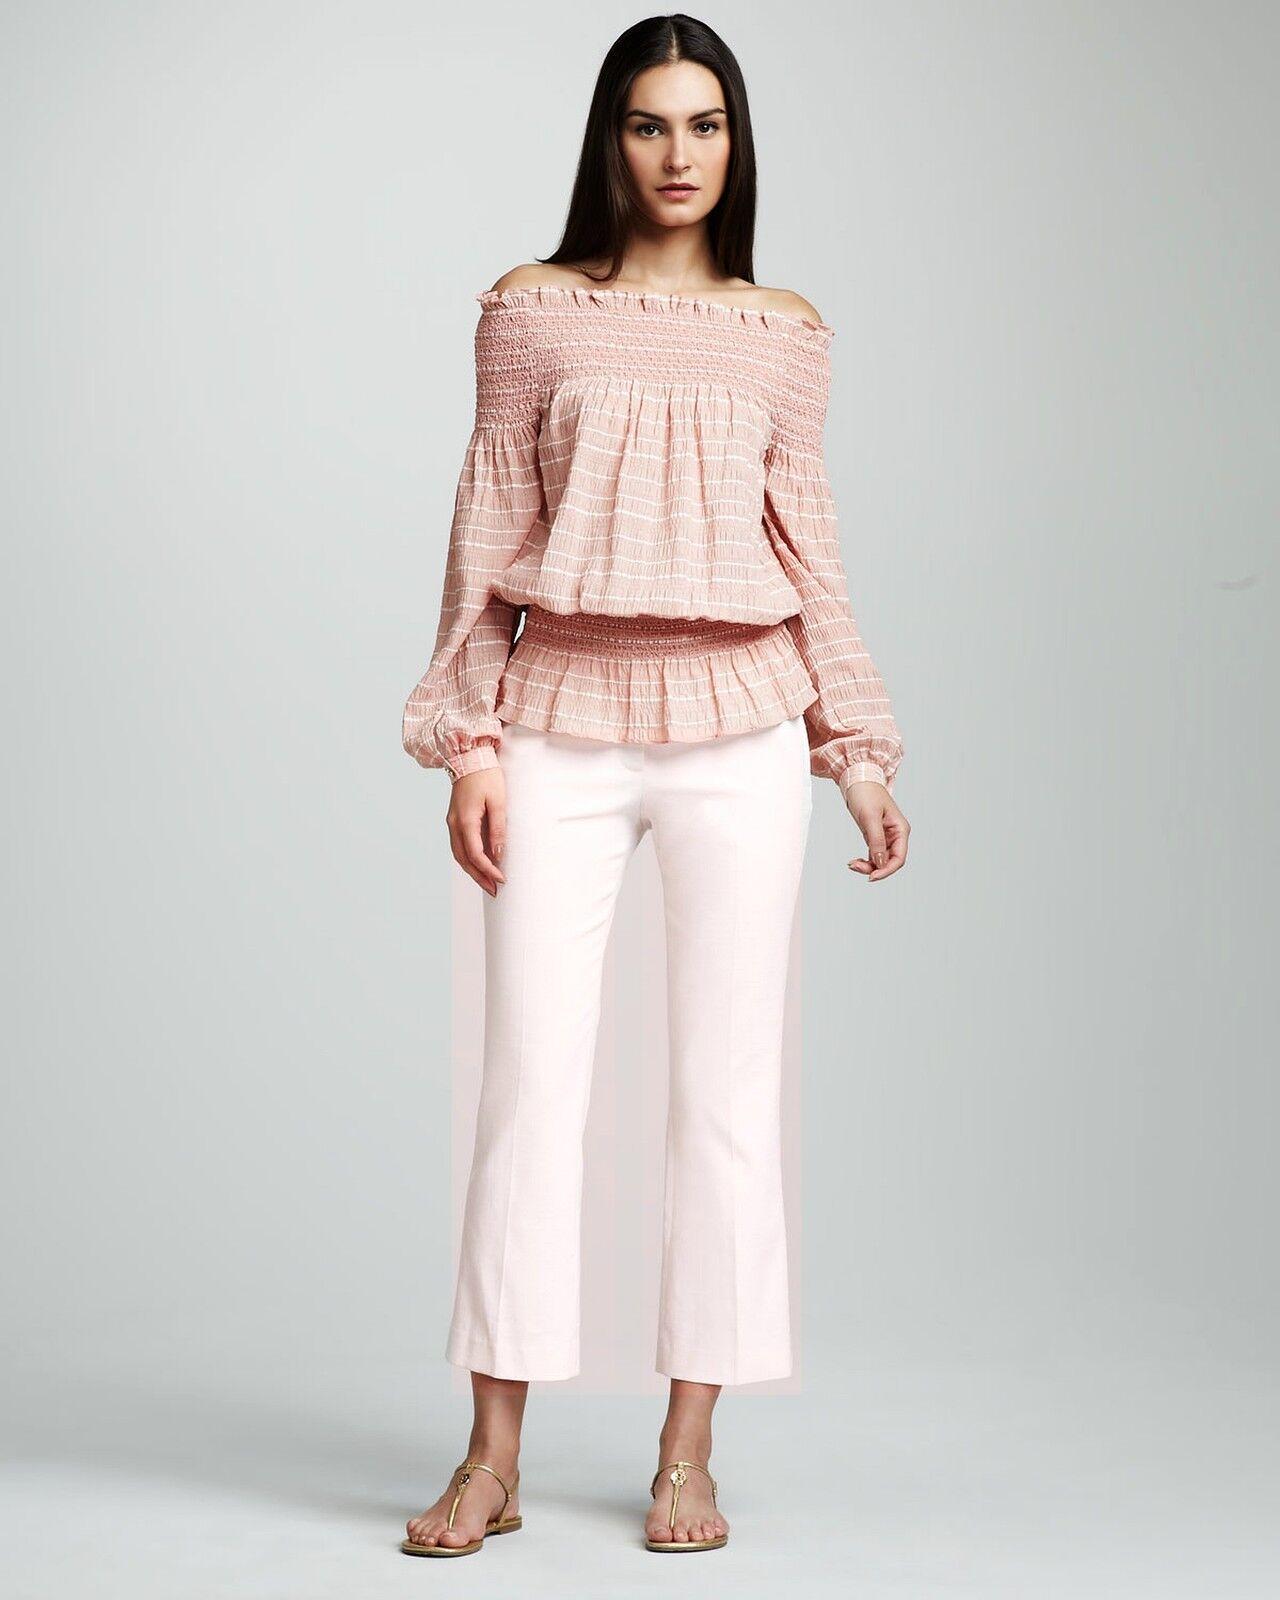 275 Tory Burch Rocco Cropped Capri Pant 8 Women Lady SEXY Stylish Pink Gift NEW